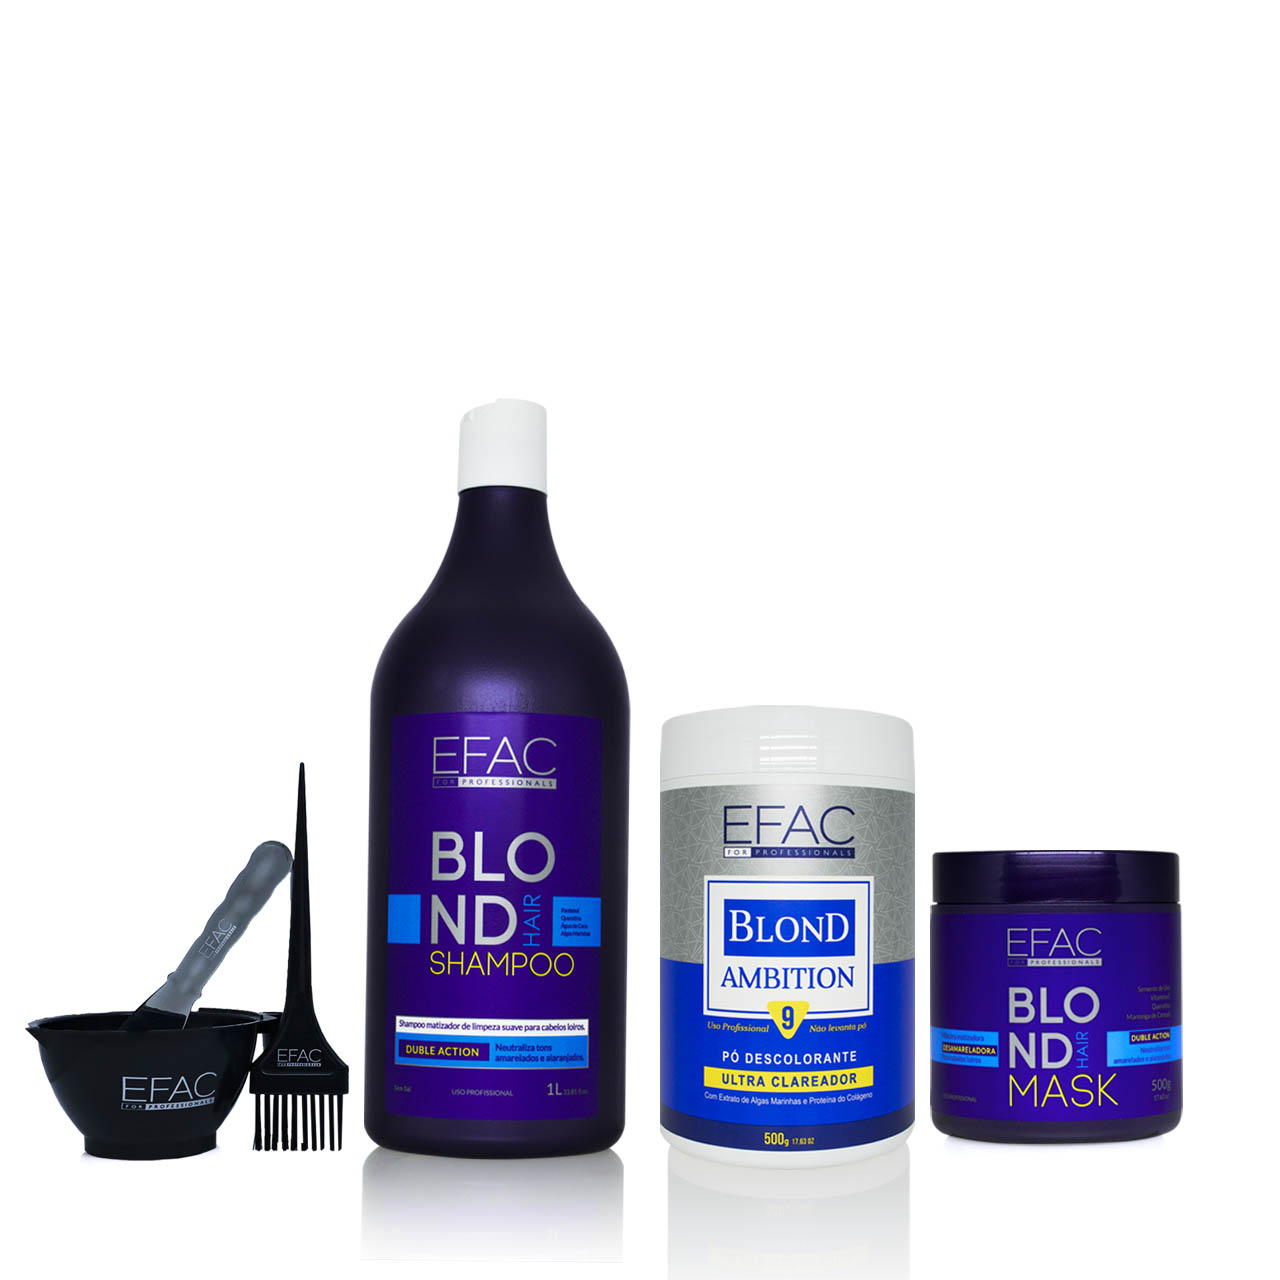 Kit Shampoo + Máscara Blond Hair + Pó Descolorante Blond Ambition Efac